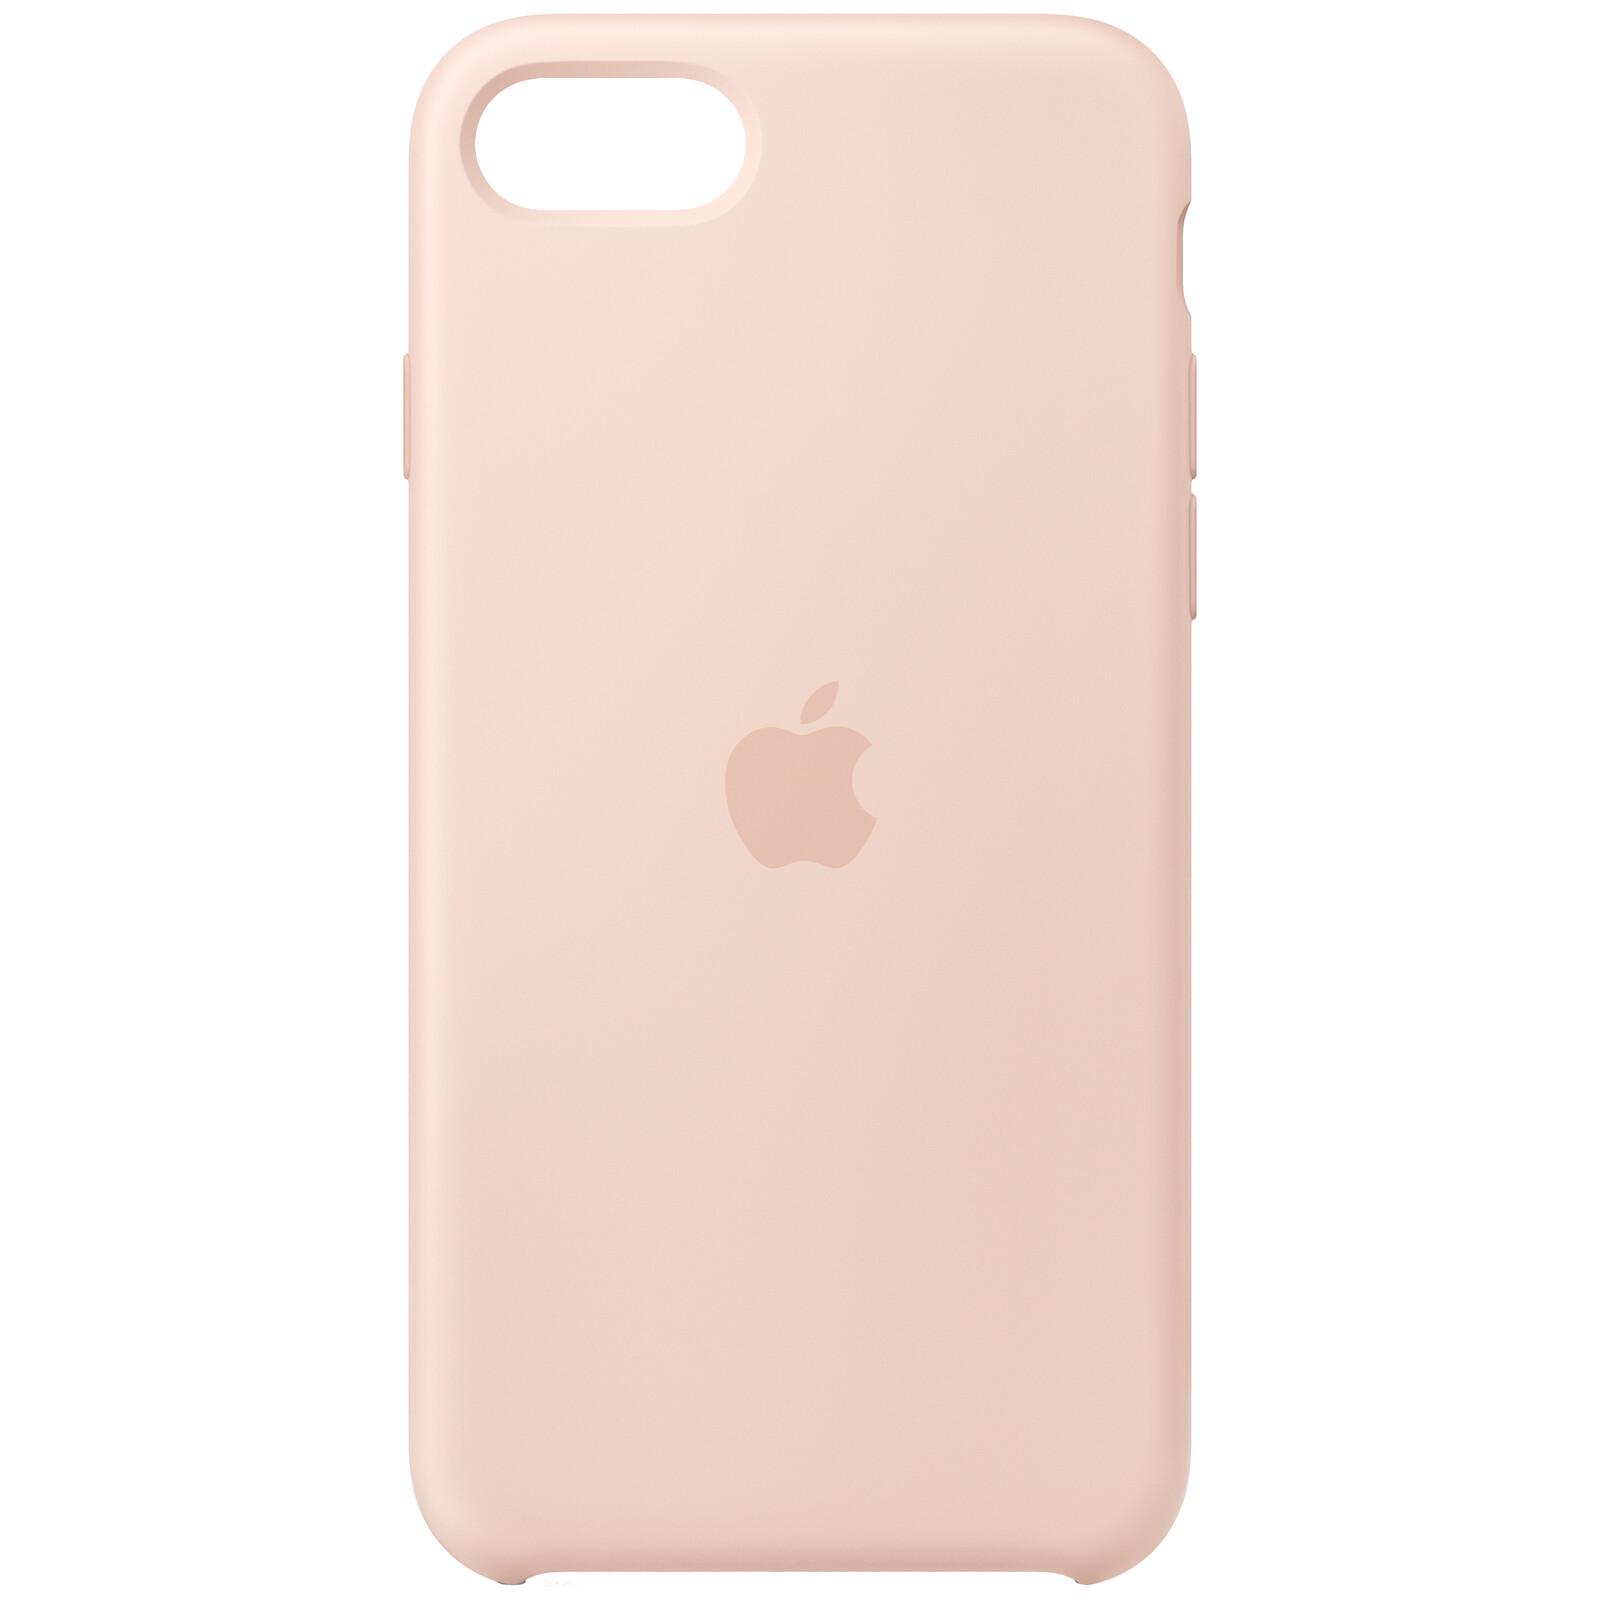 Apple Original Back Cover Silikon iPhone SE 2020 pink sand